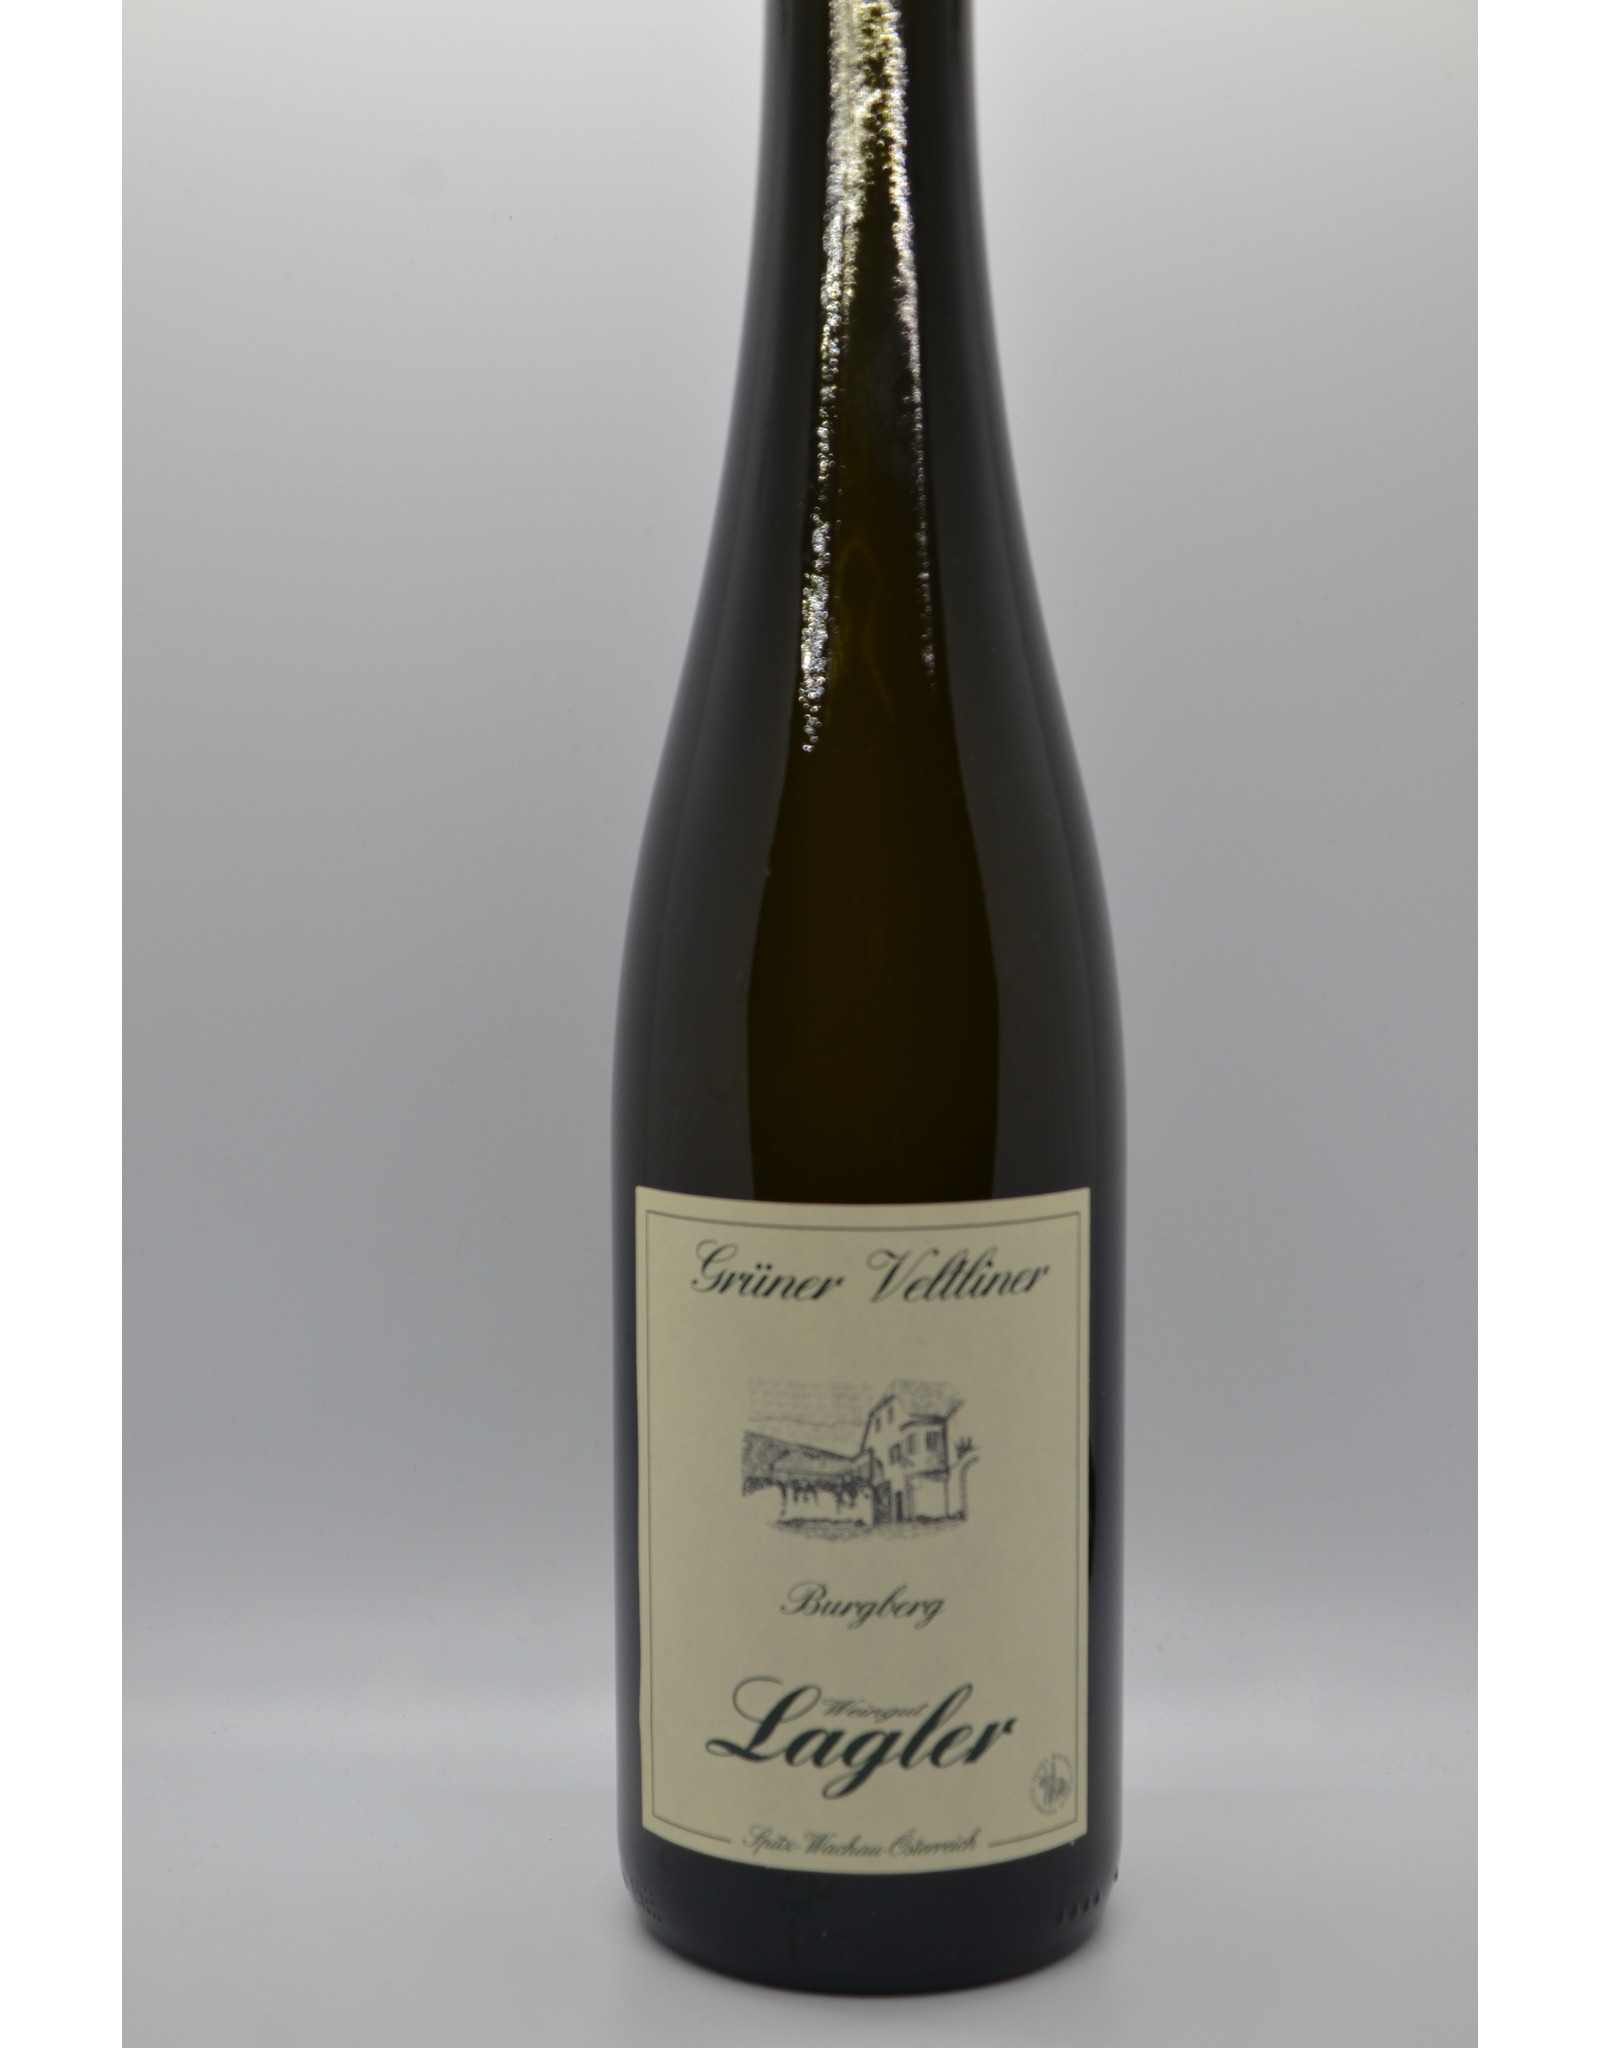 Austria Lagler Grüner Veltliner